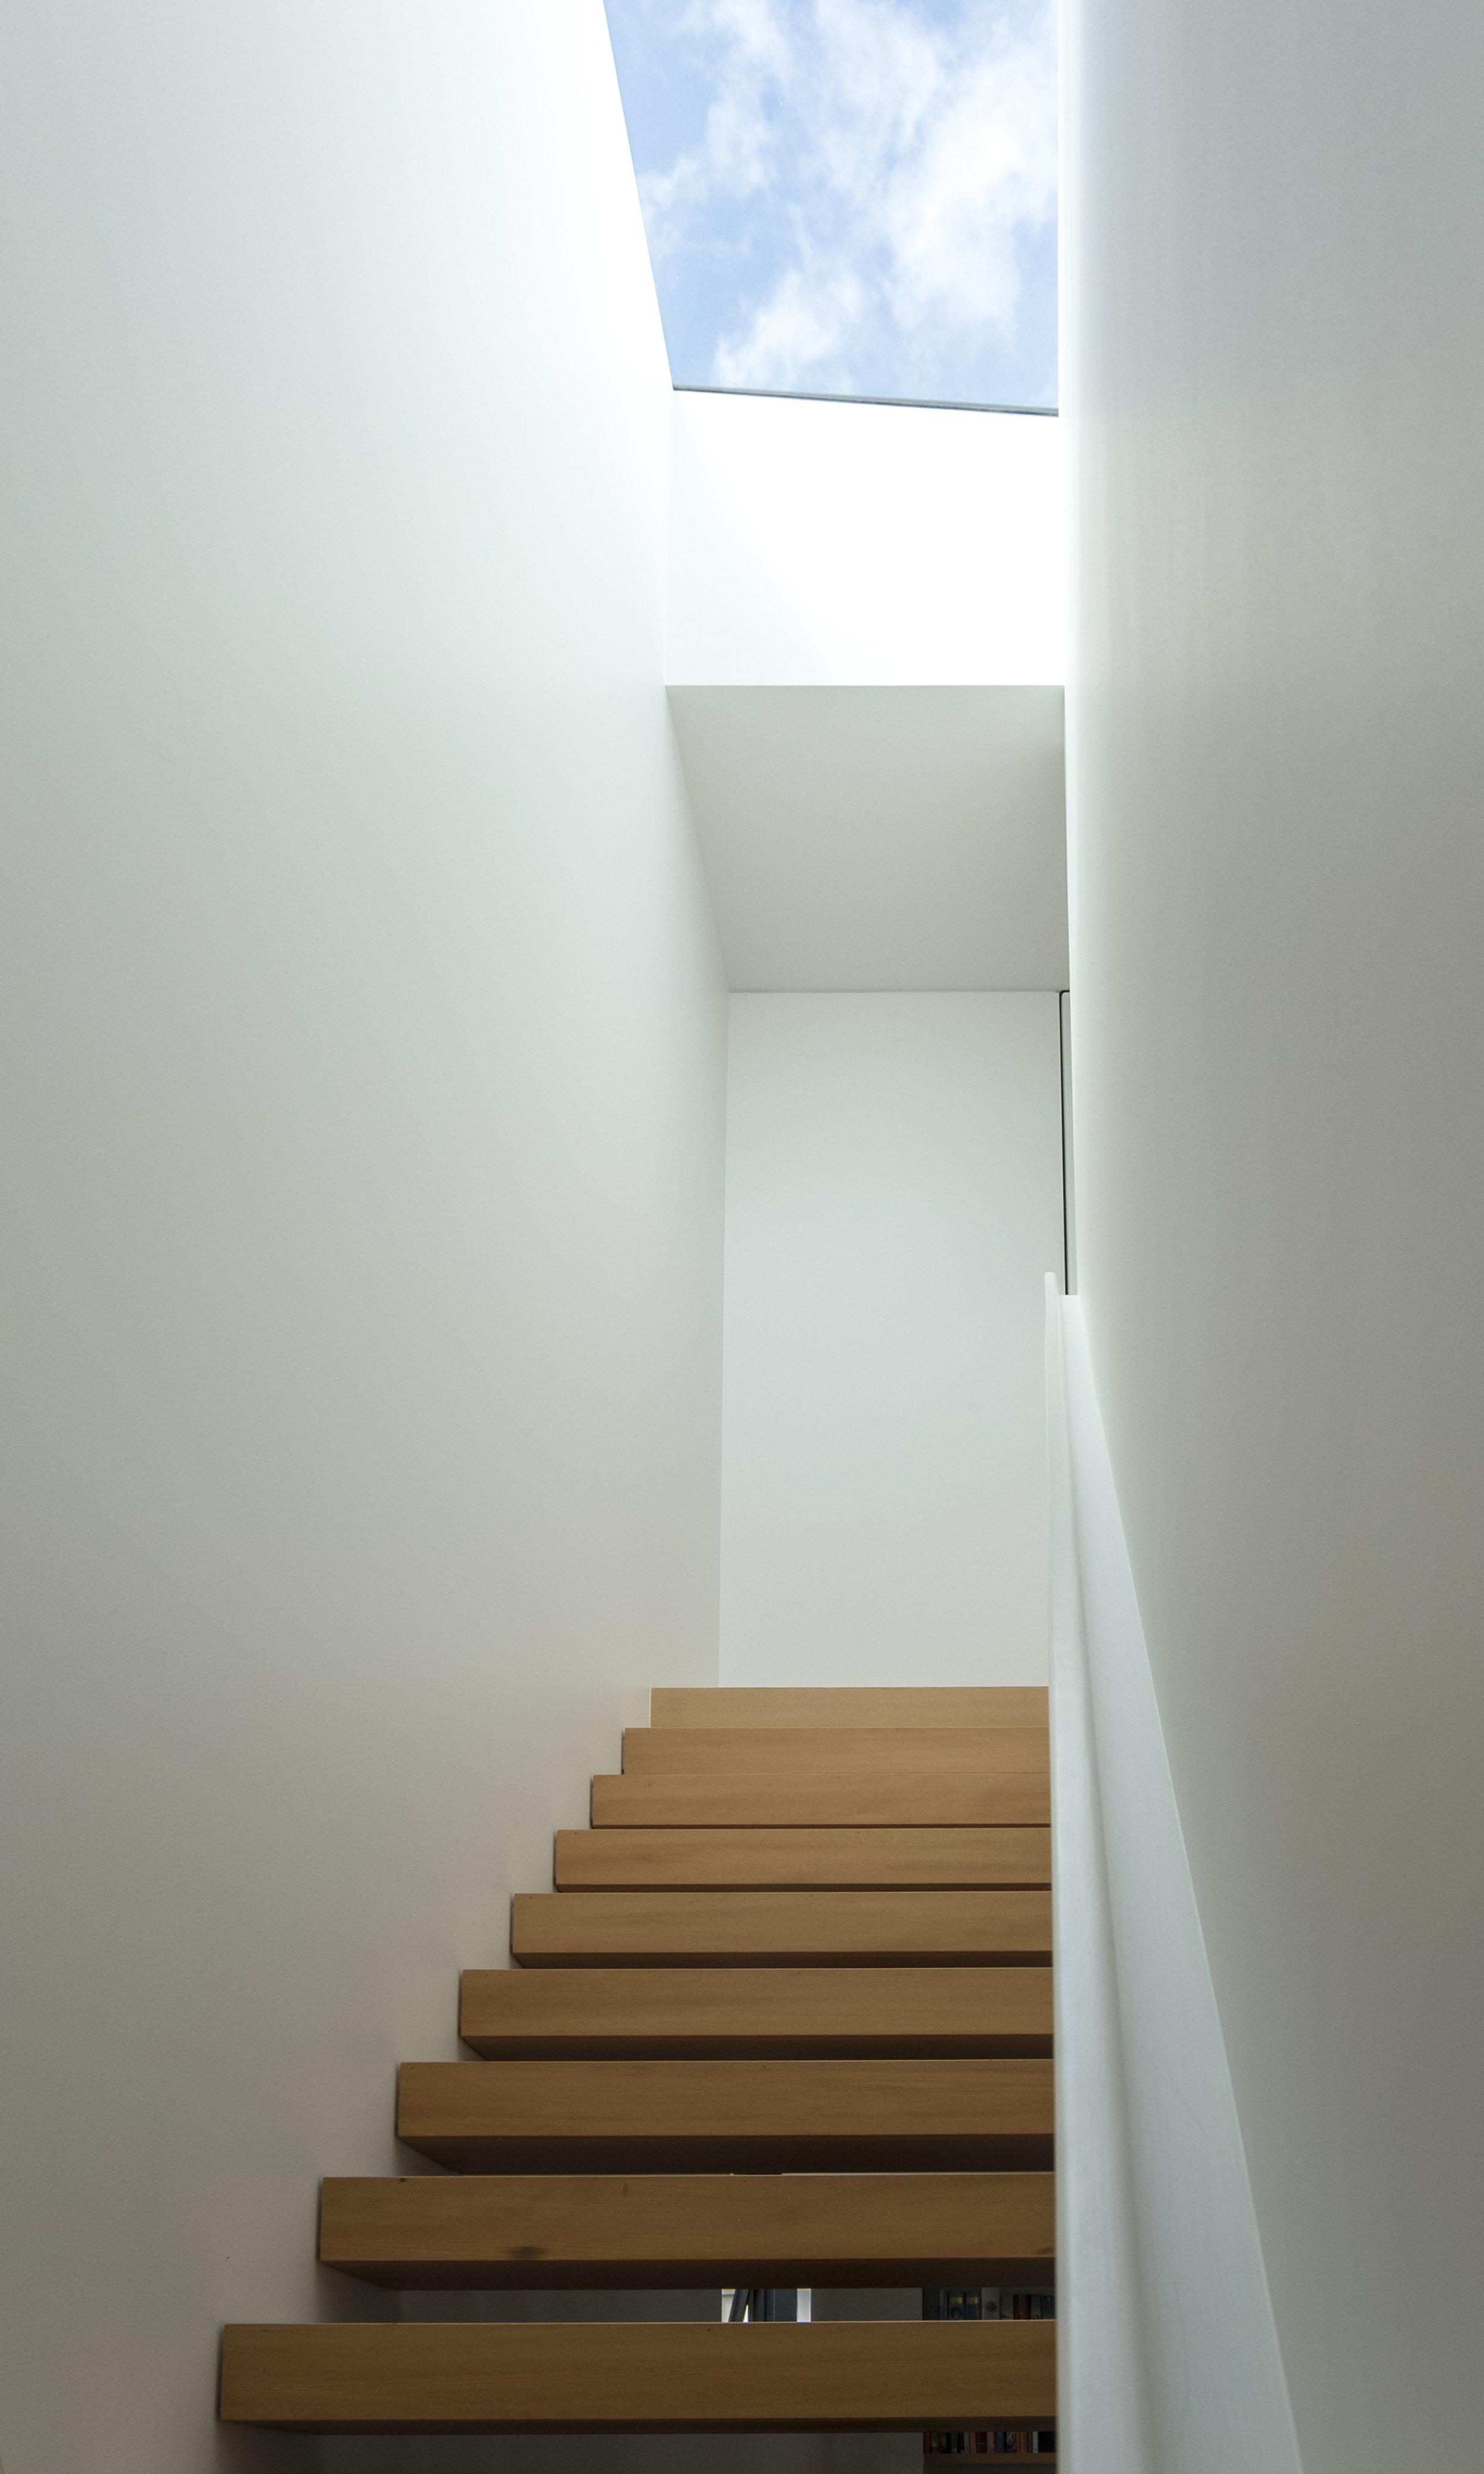 Case Study Villa_Staircase towards master bedroom_6 of 10.jpg